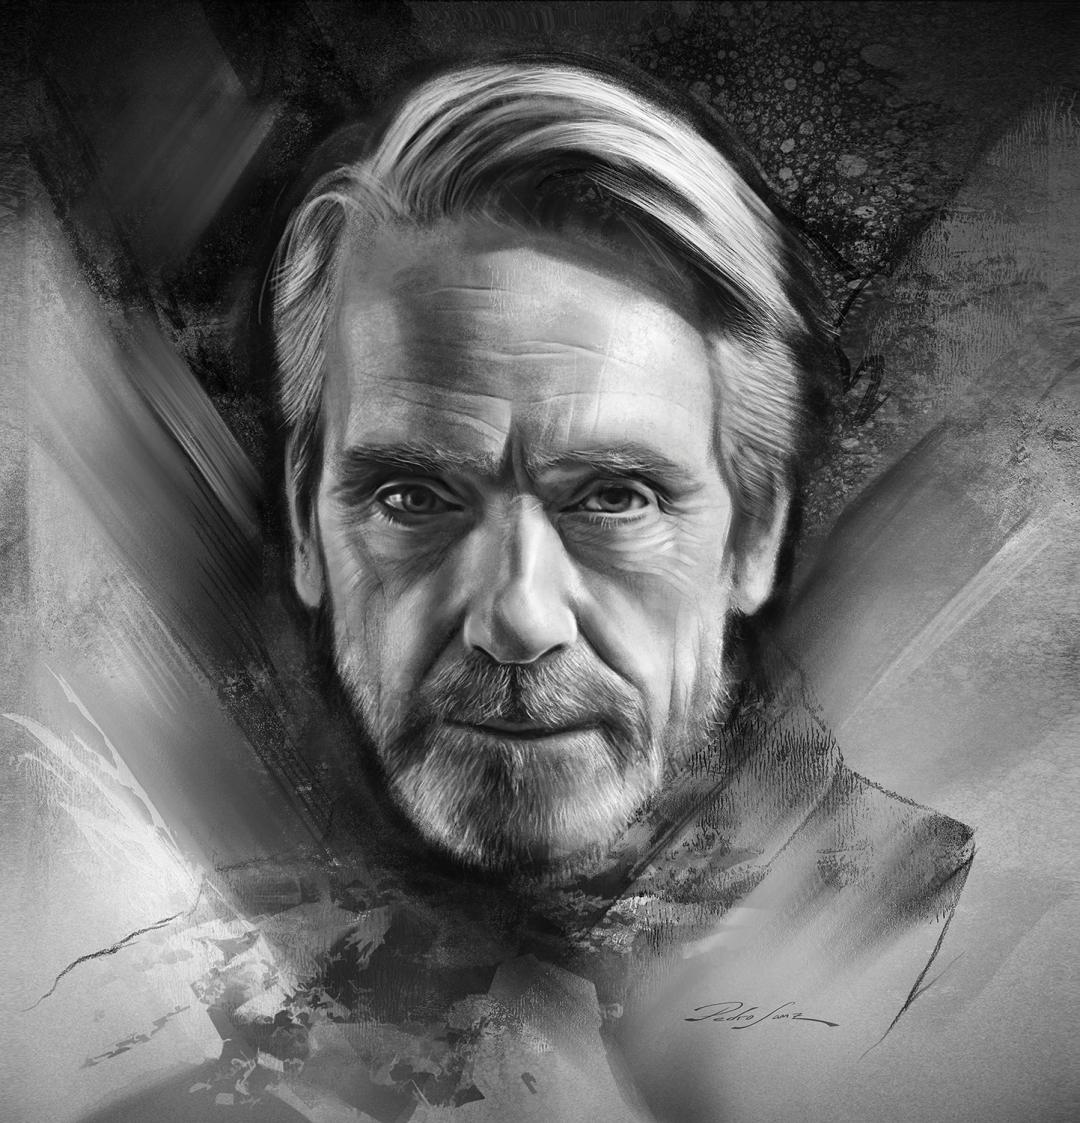 Jeremy Irons portrait